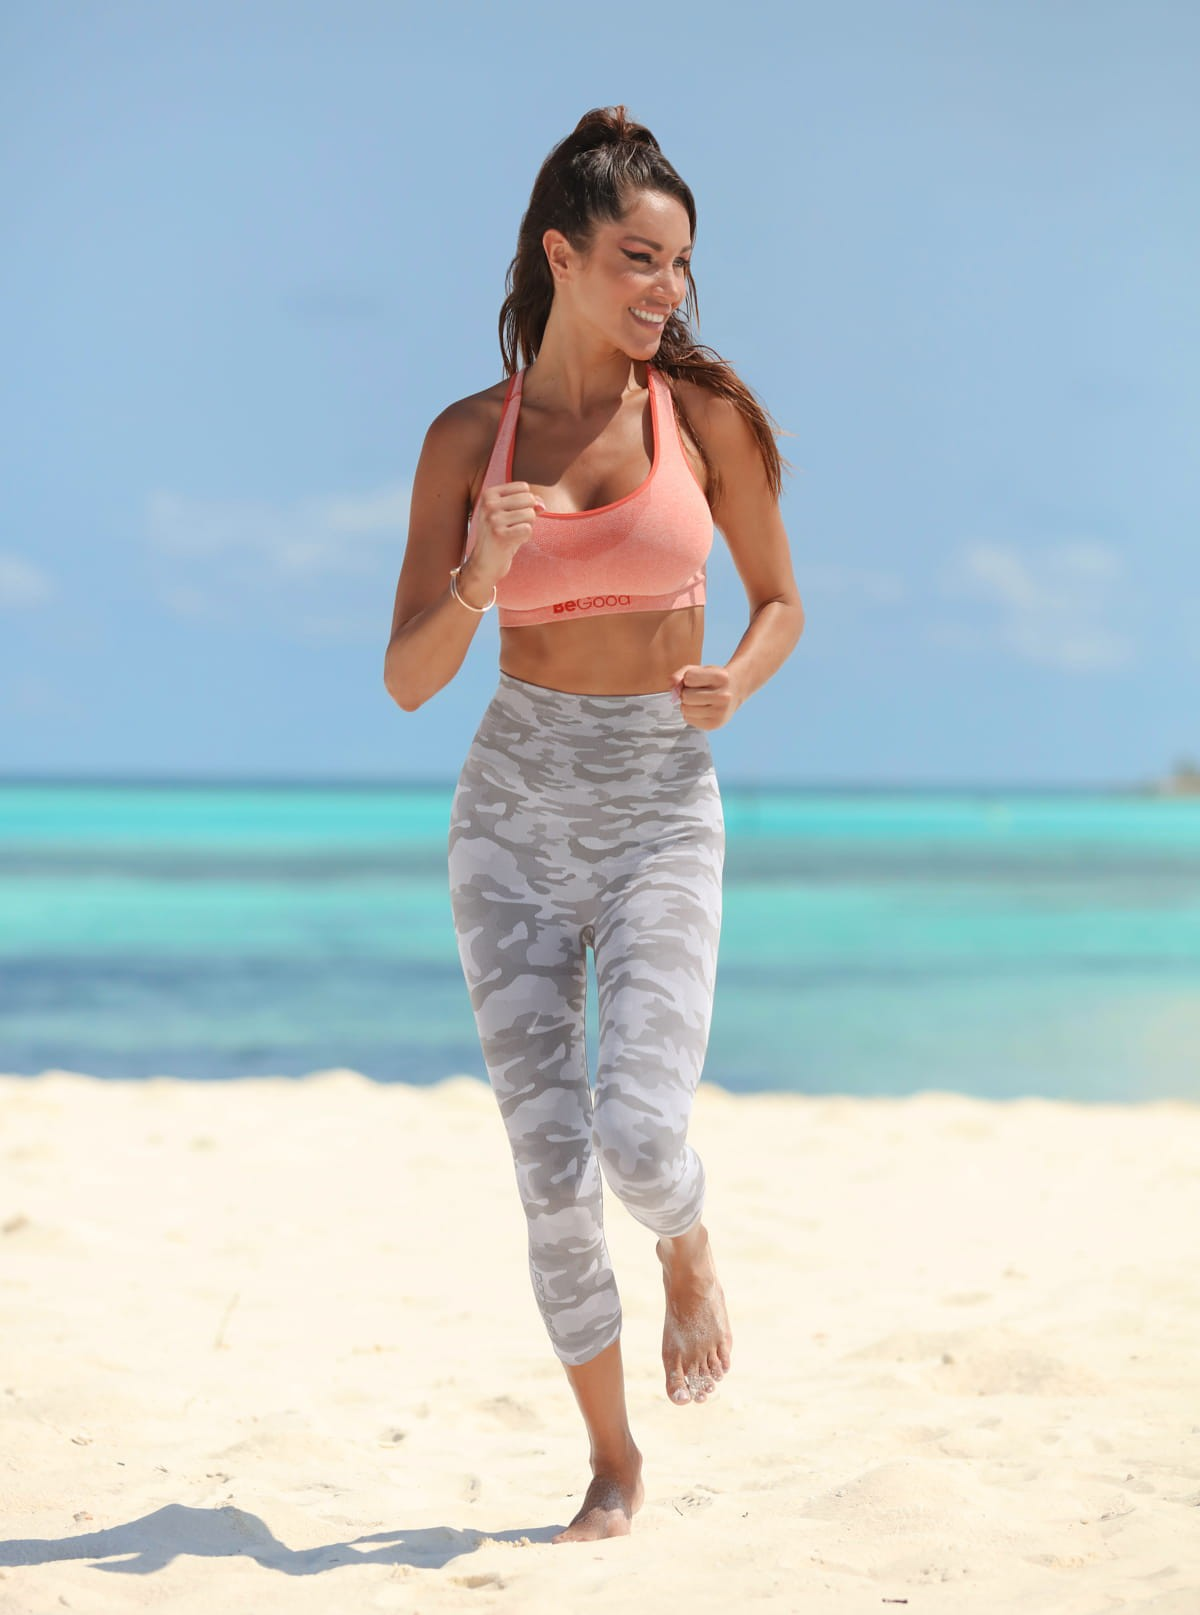 Sportset für Damen: Top Mélange + Caprihose Camouflage